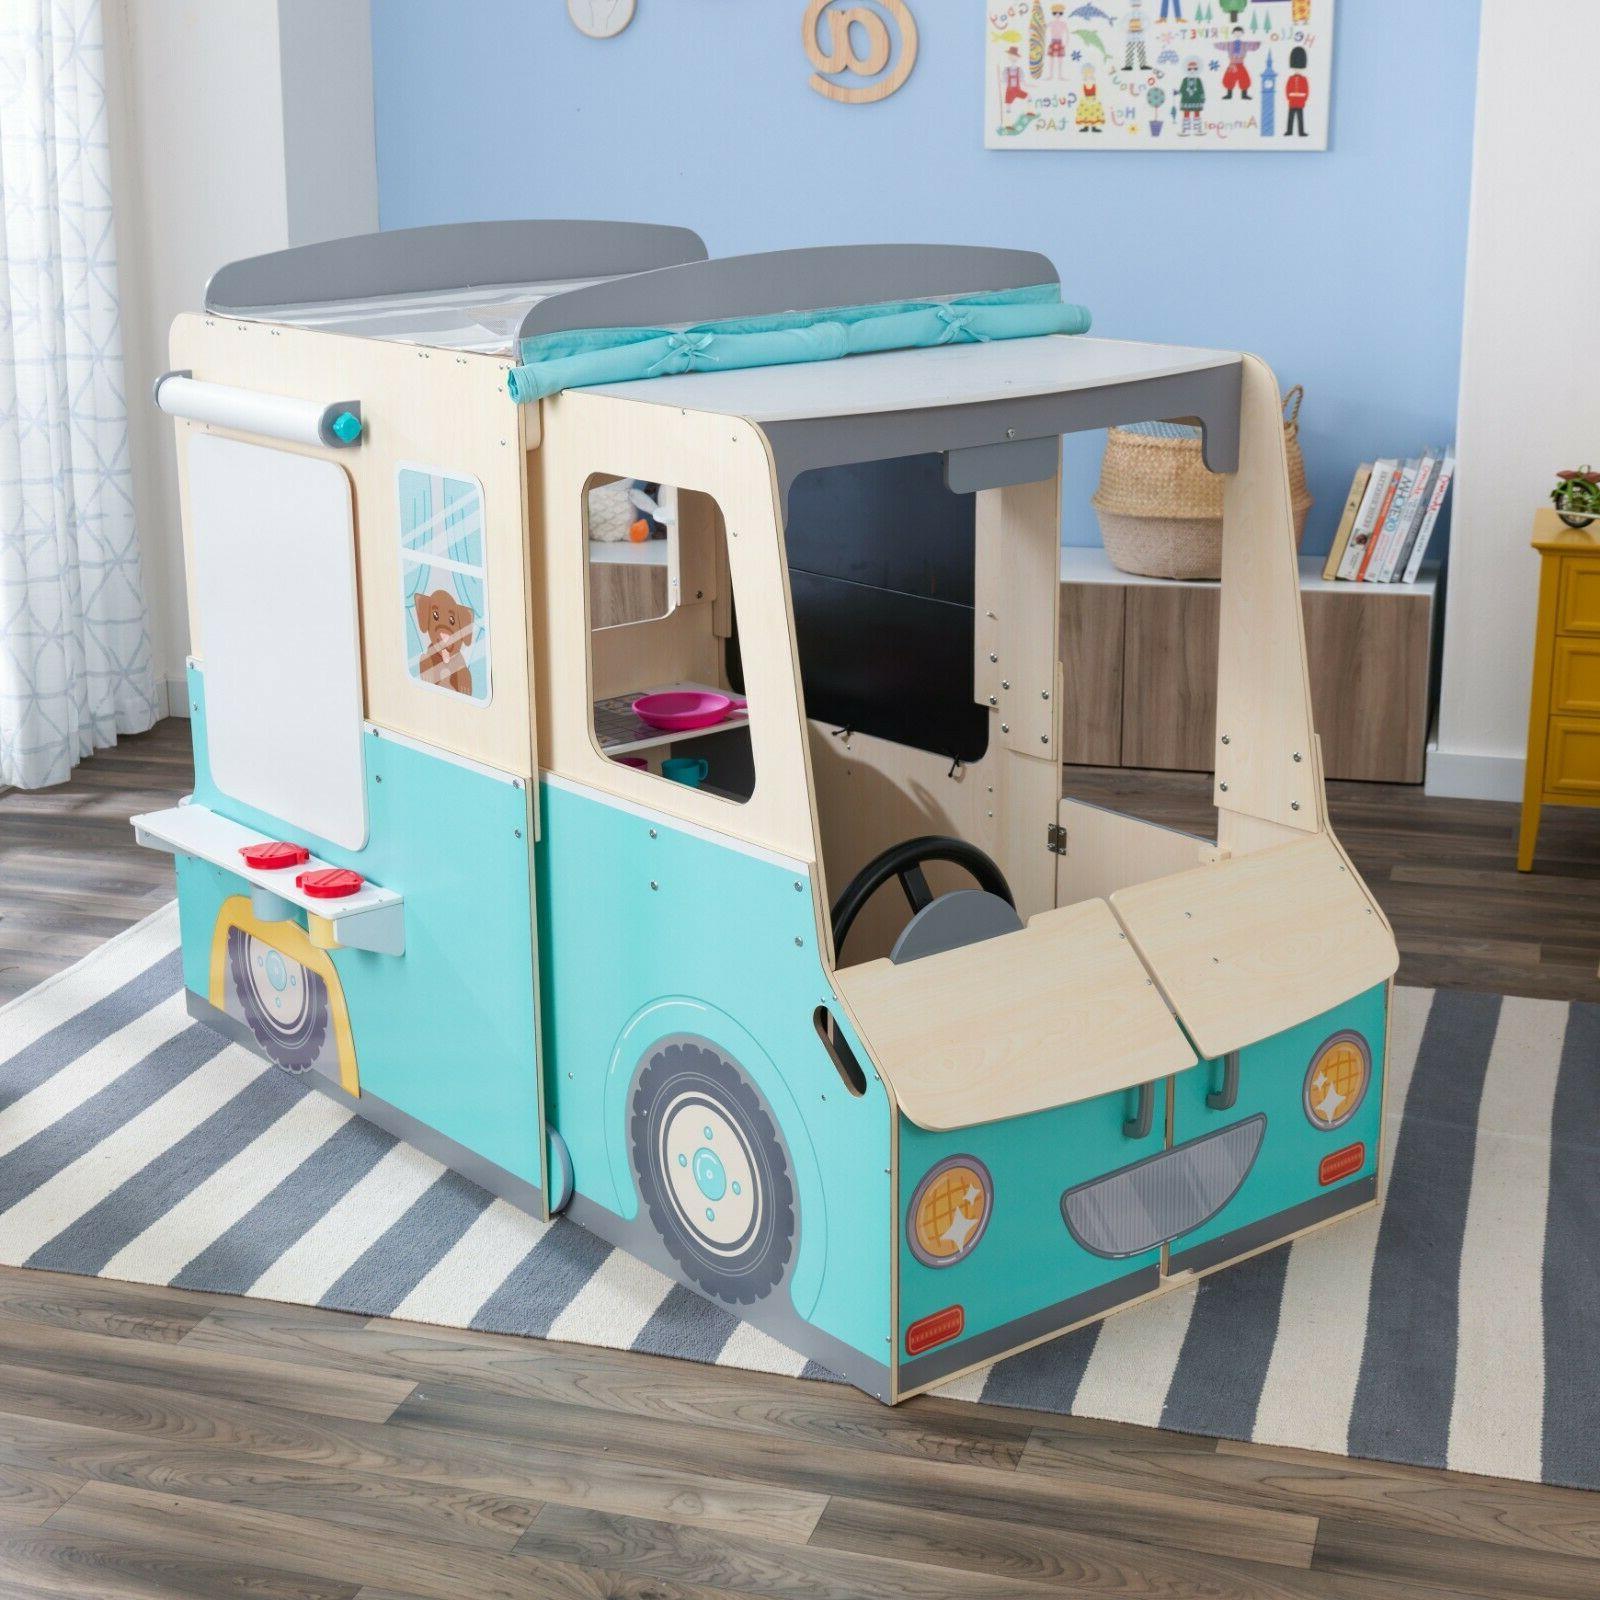 Wondervan Indoor Playhouse